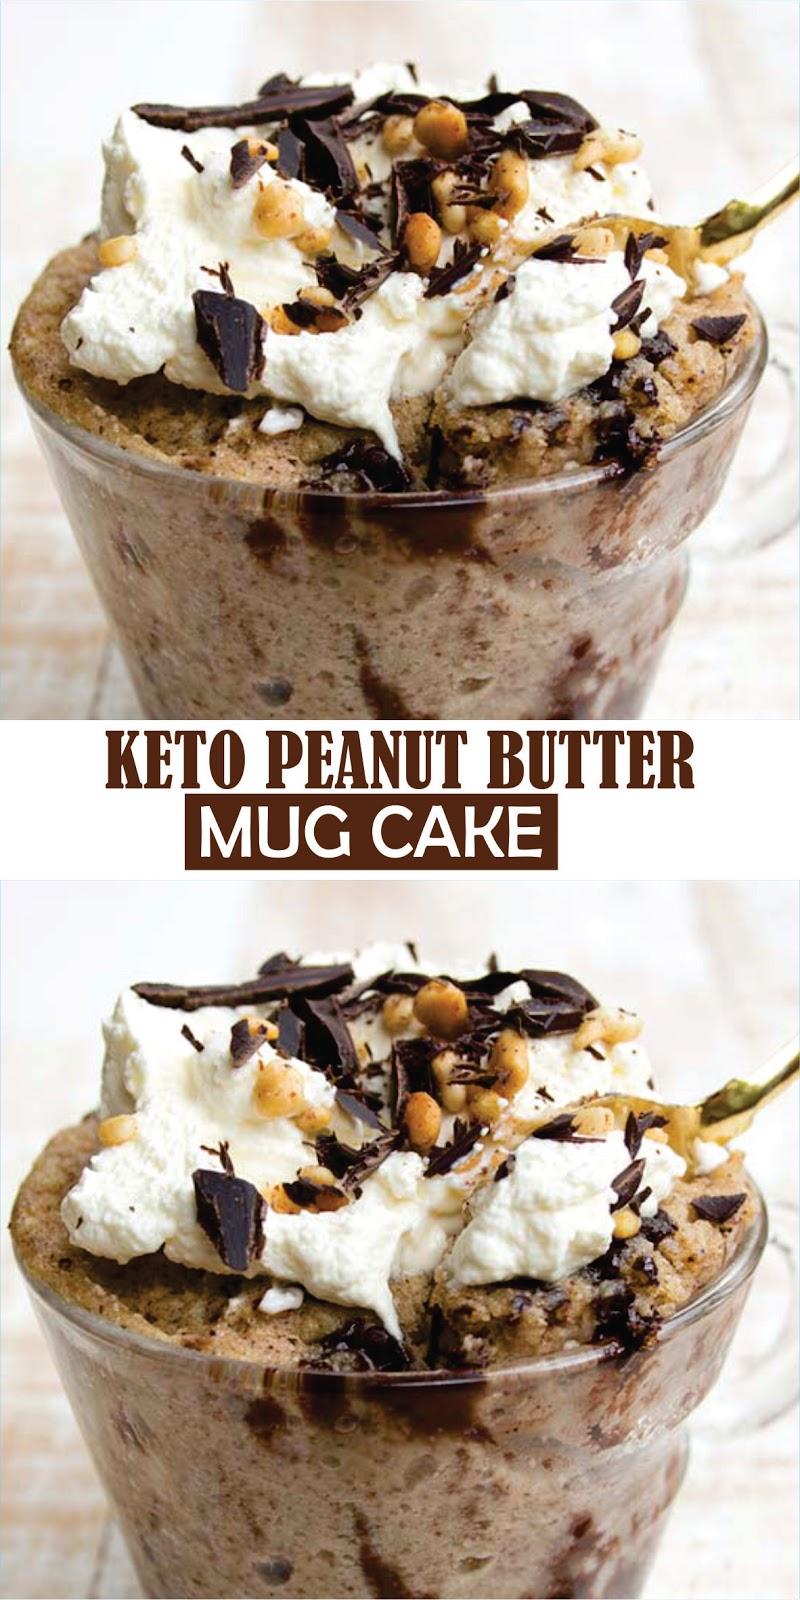 Keto Peanut Butter Mug Cake - delishmeal.biz